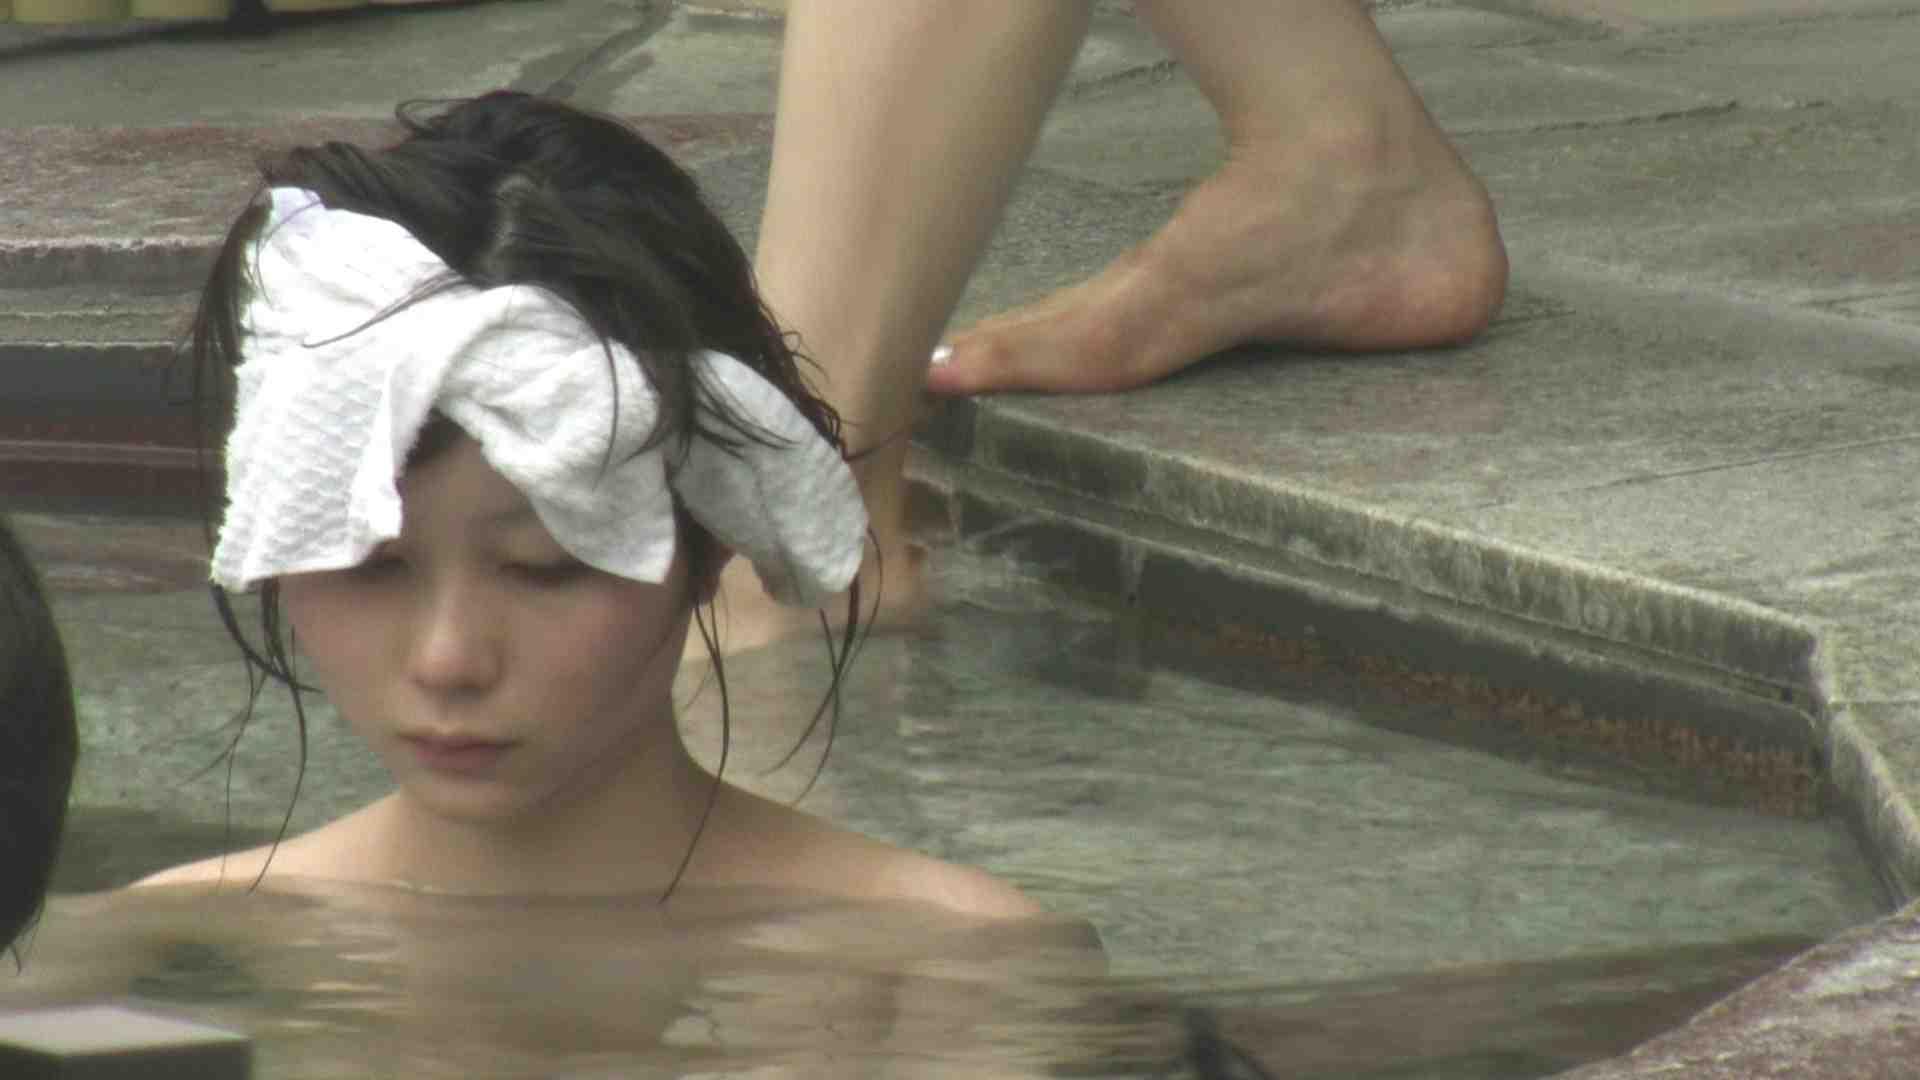 Aquaな露天風呂Vol.147 露天 濡れ場動画紹介 85画像 11